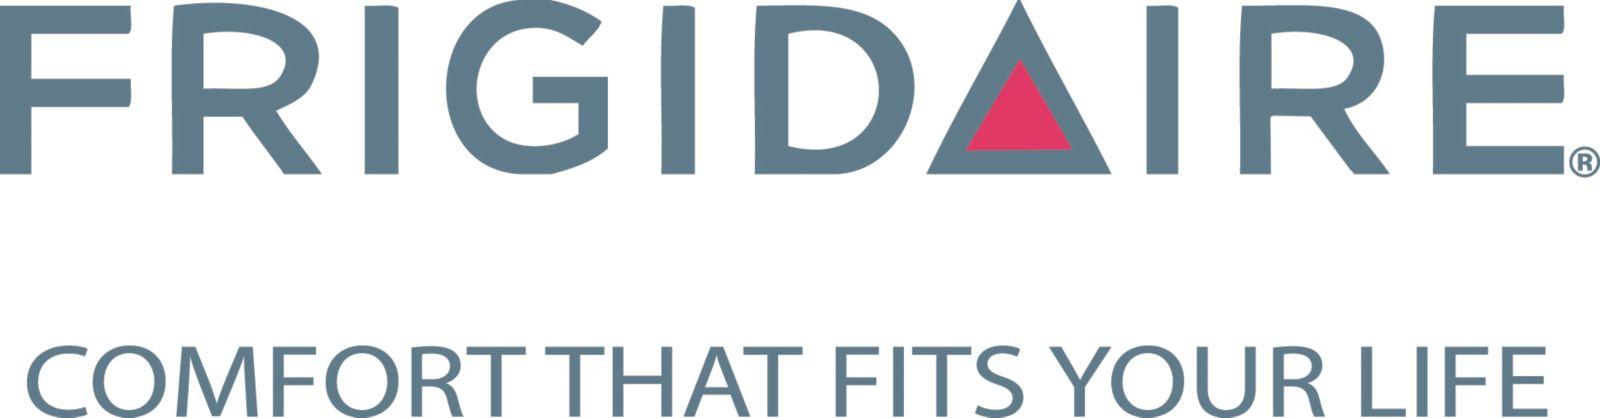 Frigidaire Appliance Logo Frigidaire 904989F  Fg7Sa 072C24B1  80% 1 Stage Fixed Speed